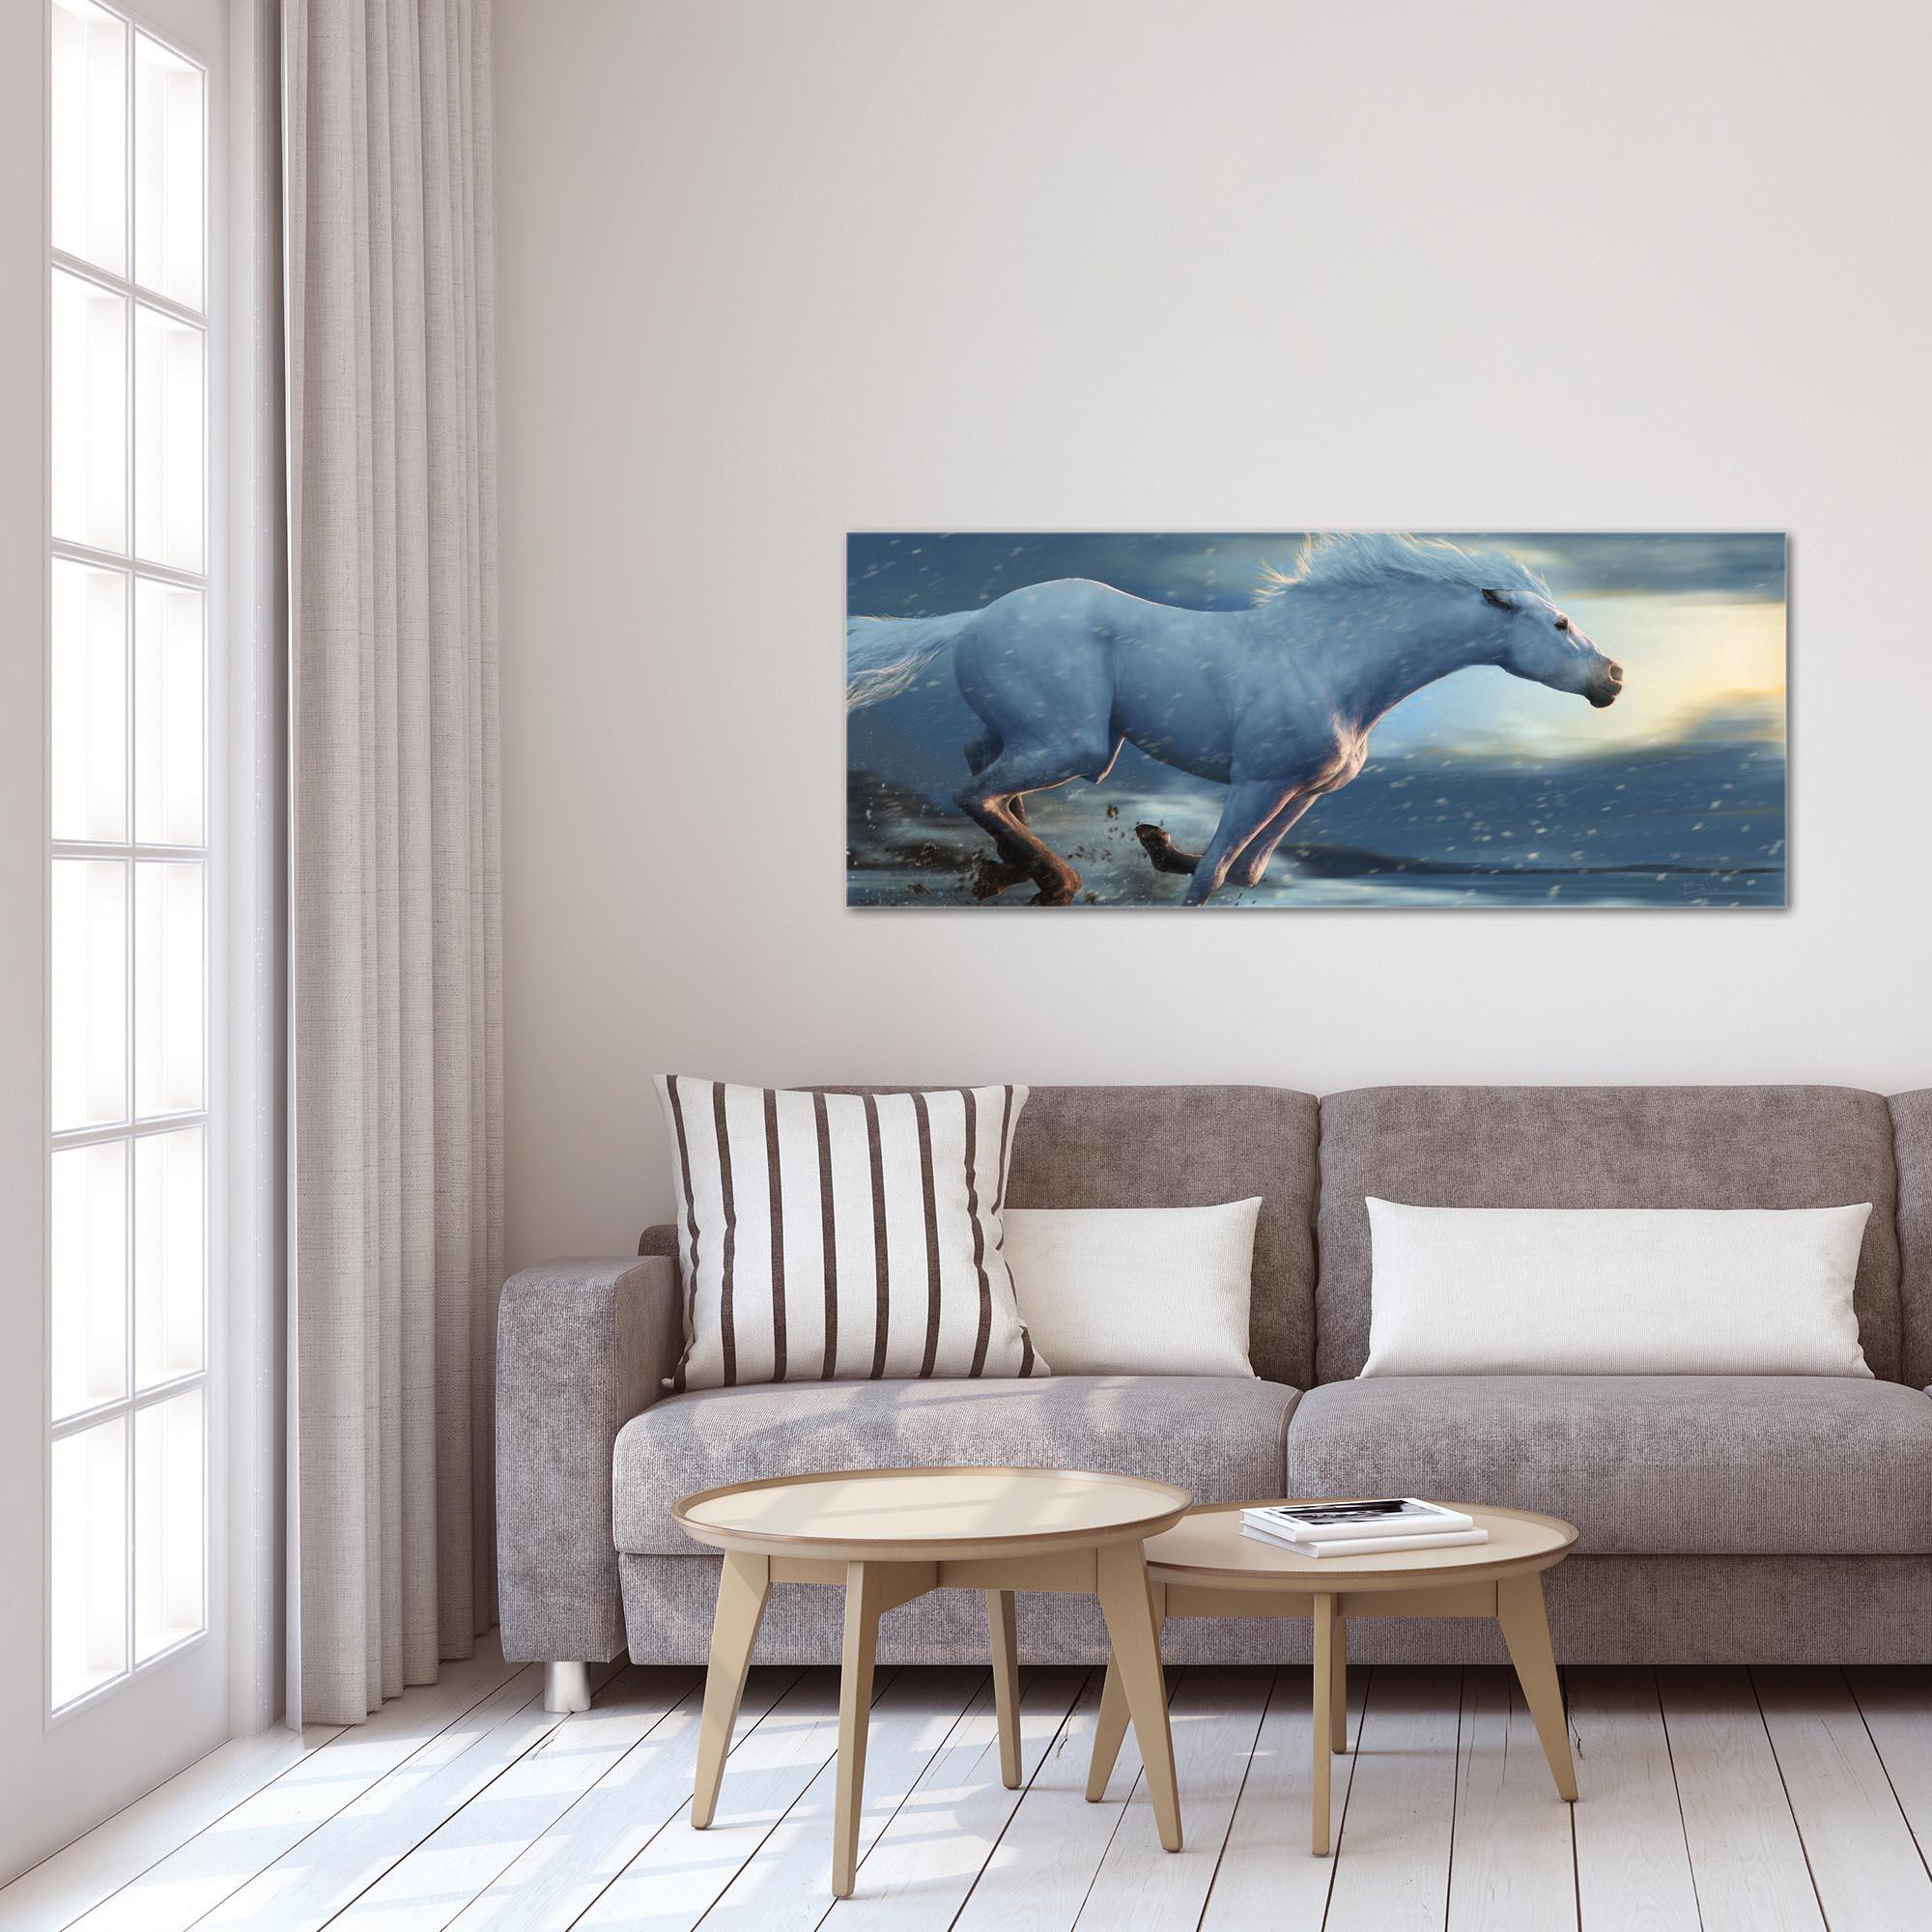 Expressionist Wall Art 'Running Horse' - Wildlife Decor on Metal or Plexiglass - Image 3